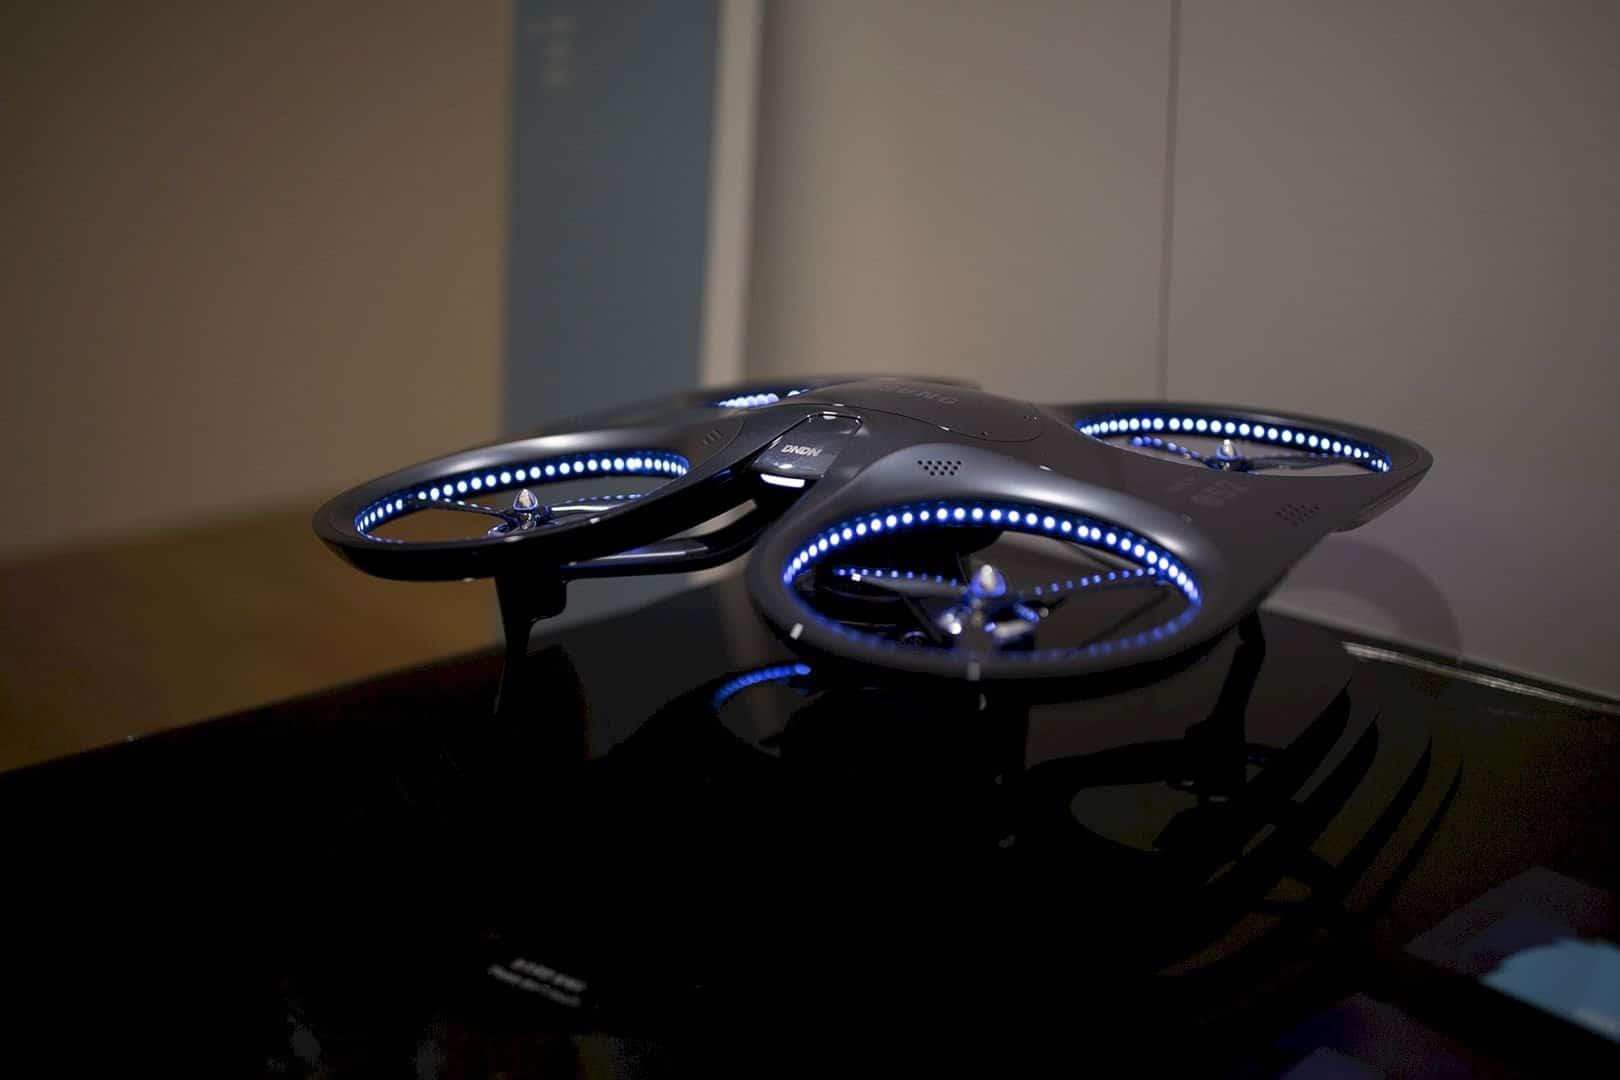 DNDN A Public Drone Safety Escort Service 20